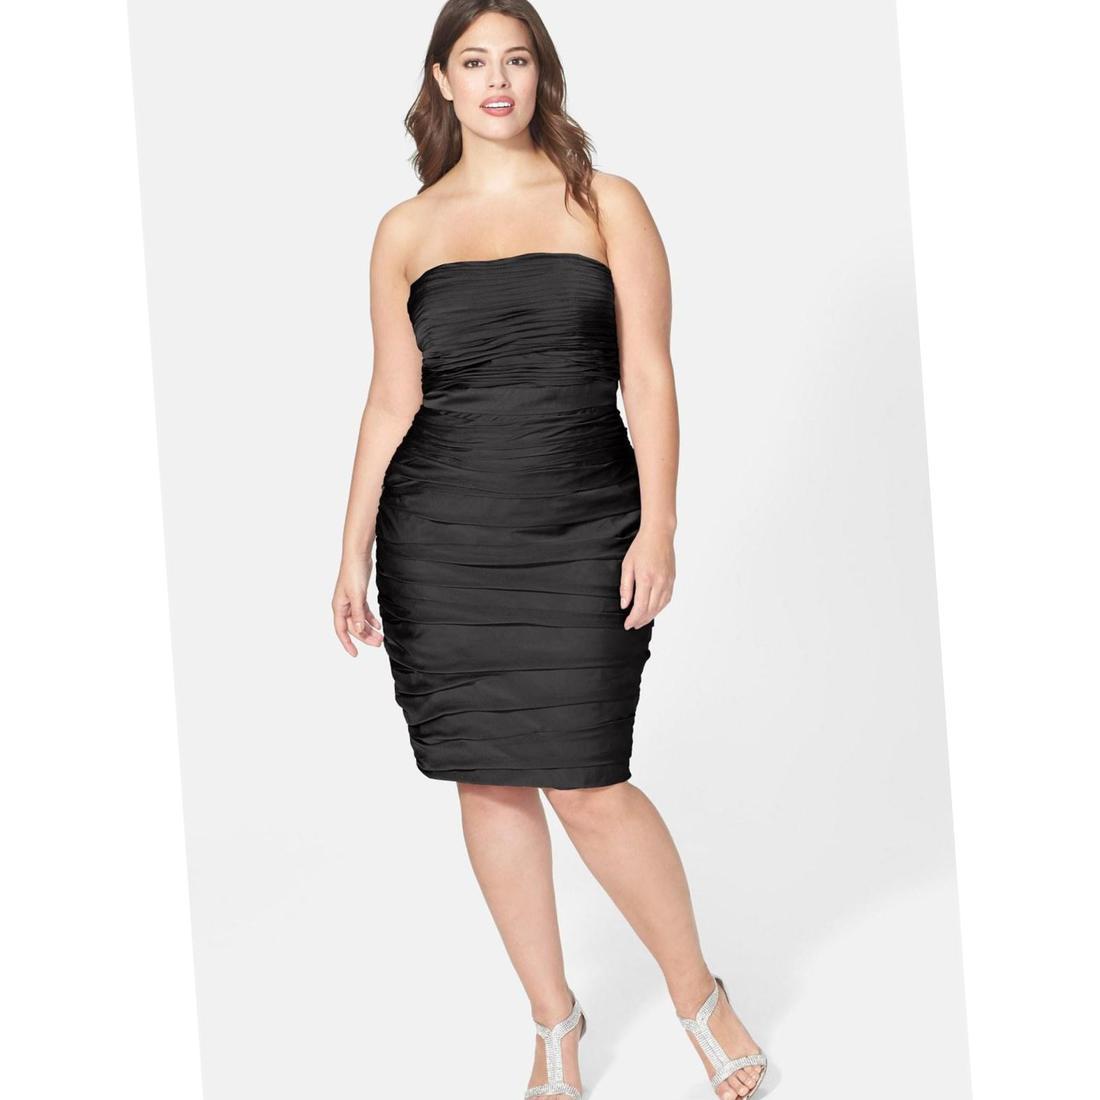 Strapless Plus Size Dresses 98